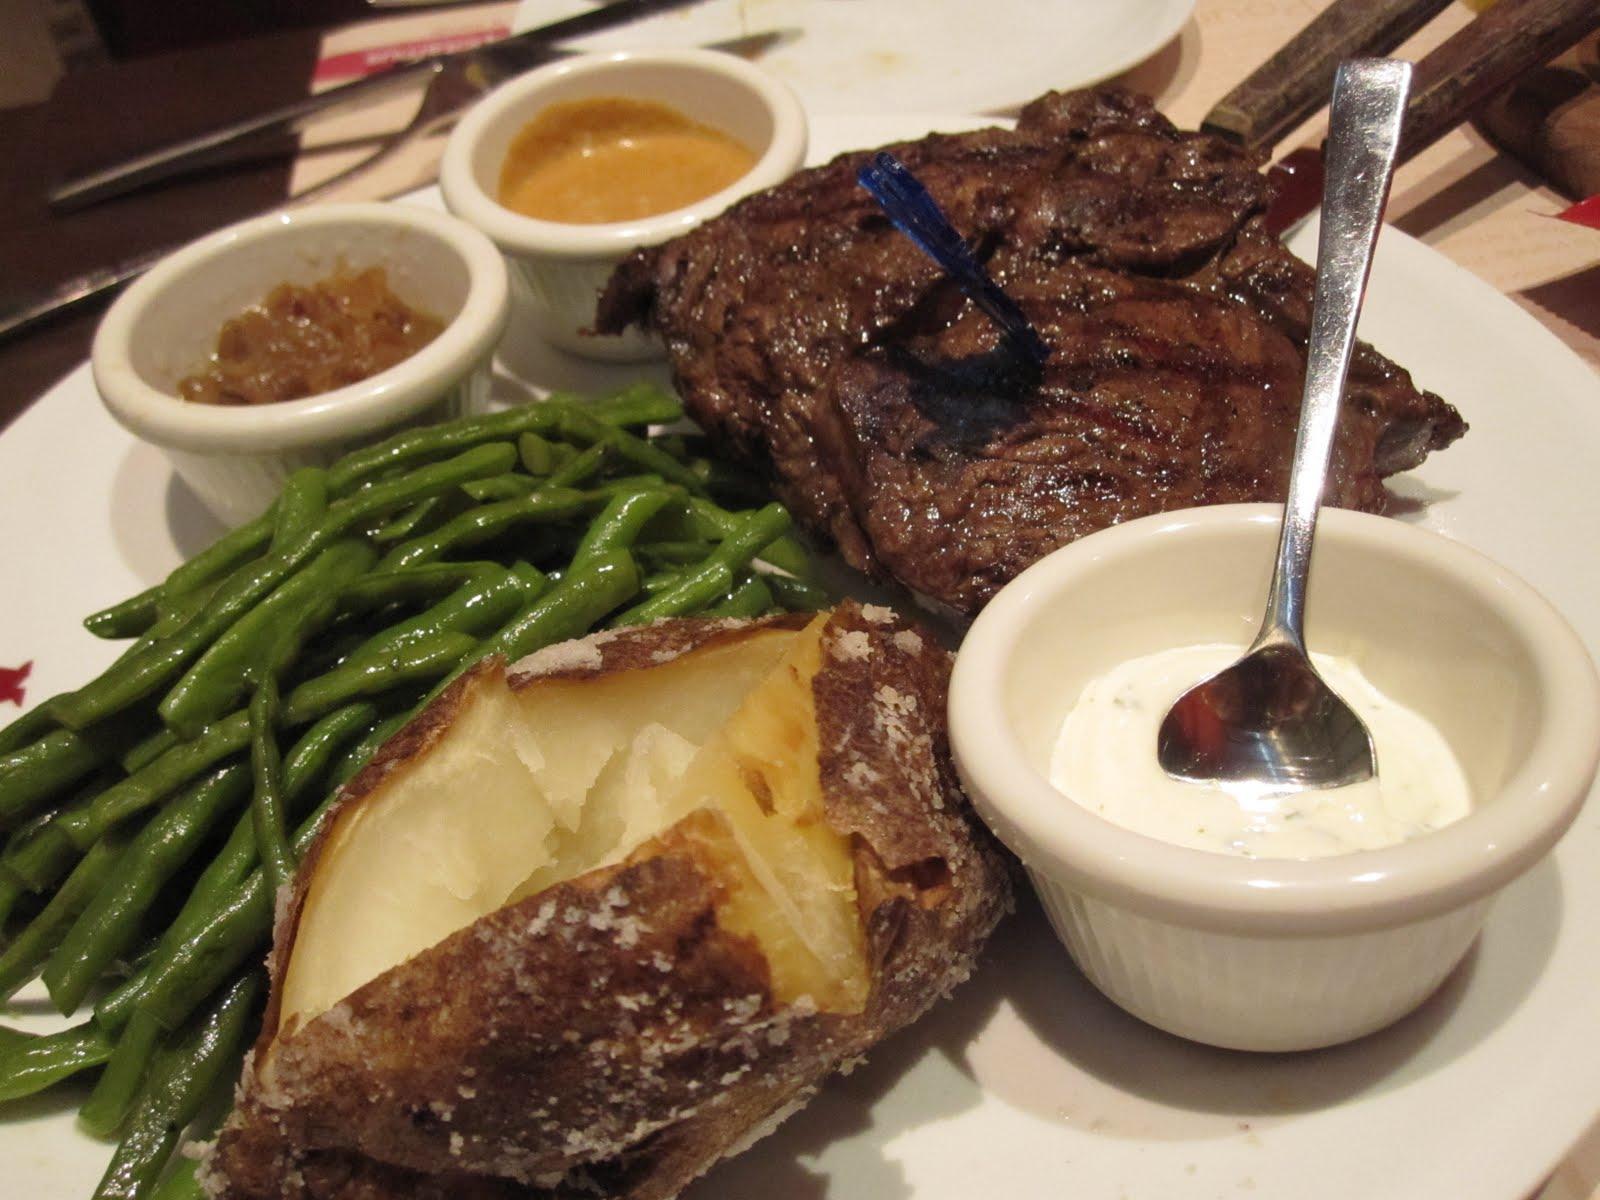 Small potatoes make the steak look bigger hippopotamus restaurant grill marina square - Hippopotamus restaurant grill ...